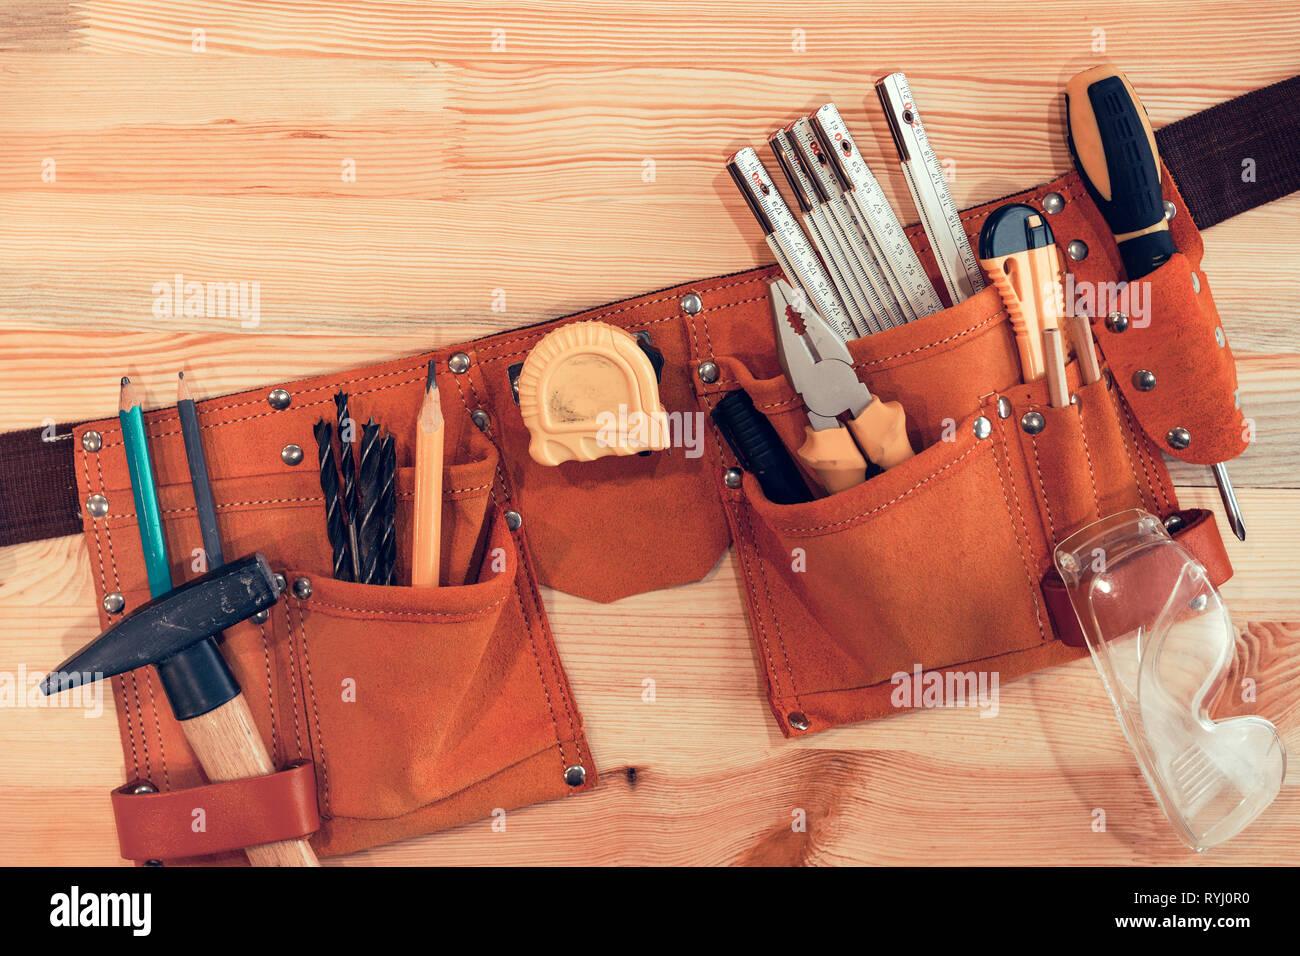 Organized handyman tool belt on work desk Stock Photo